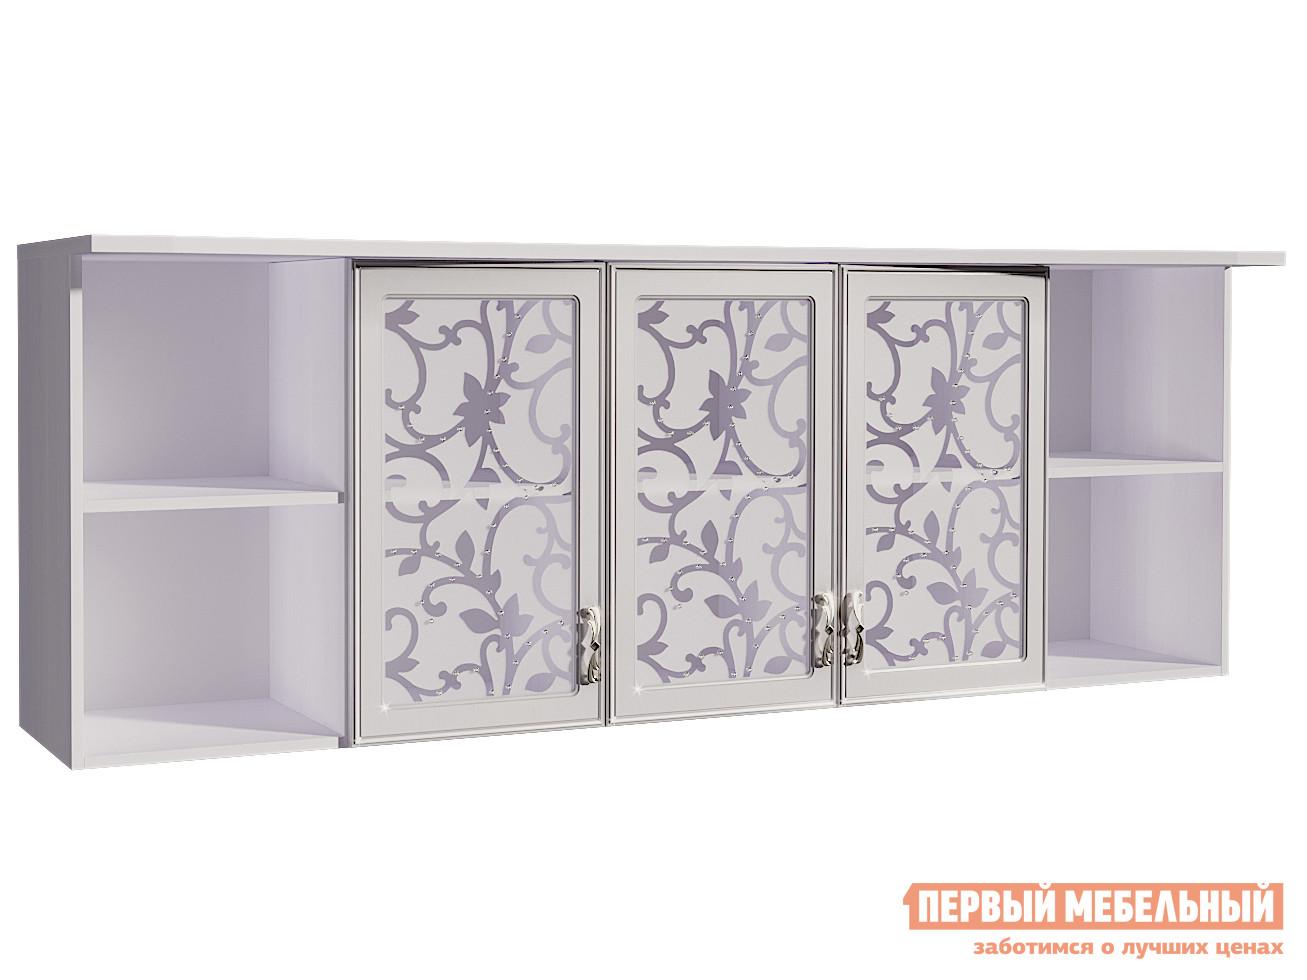 Навесной шкаф ТД Арника Шкаф навесной Мелания 10